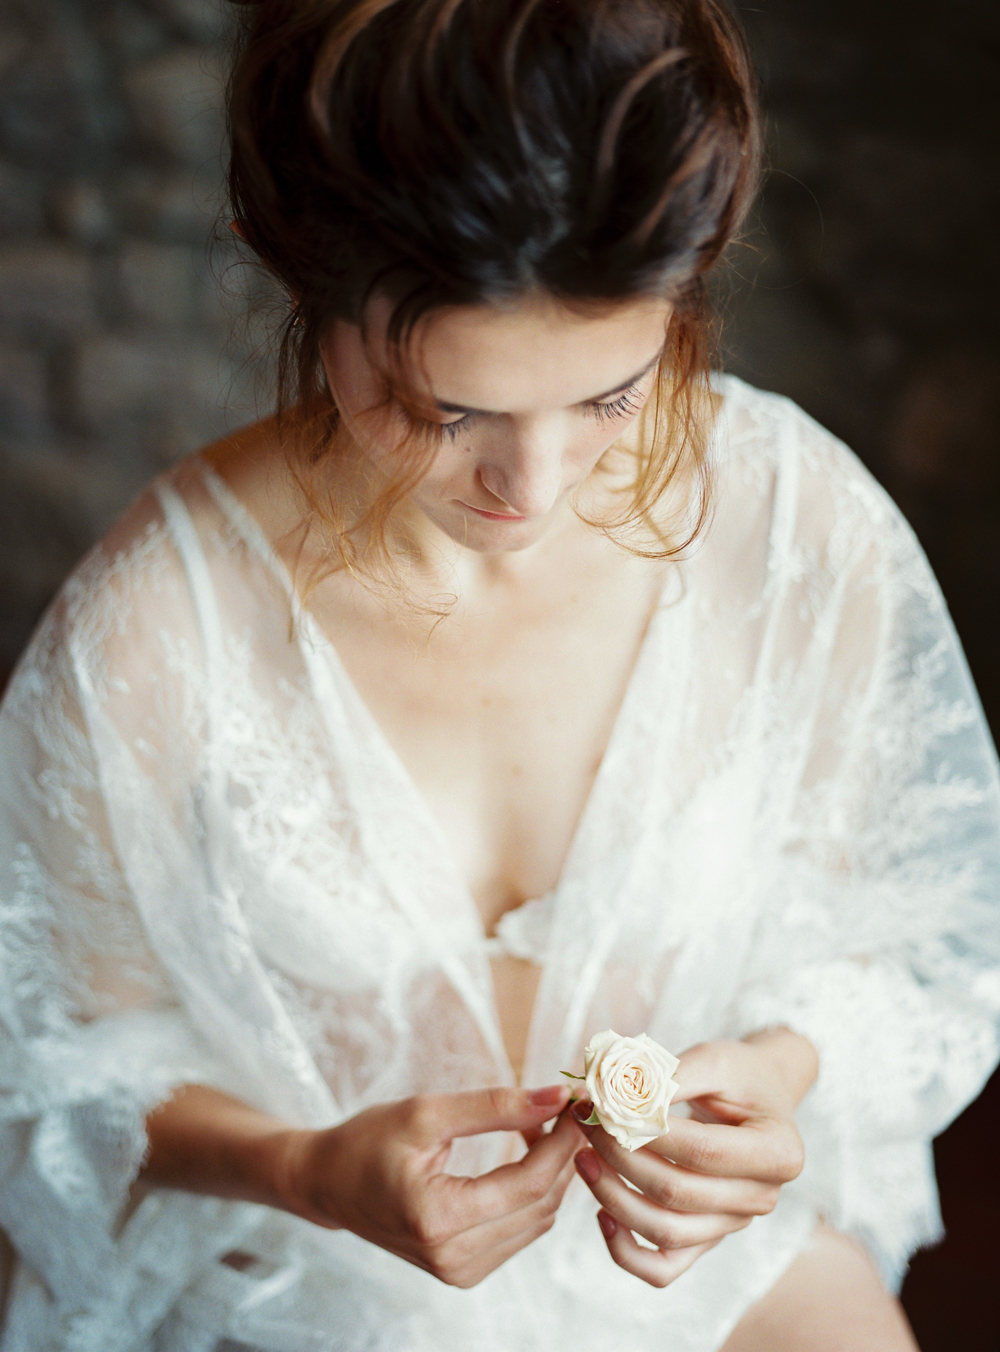 celine_chhuon_photography_Provence_Bride06.jpg